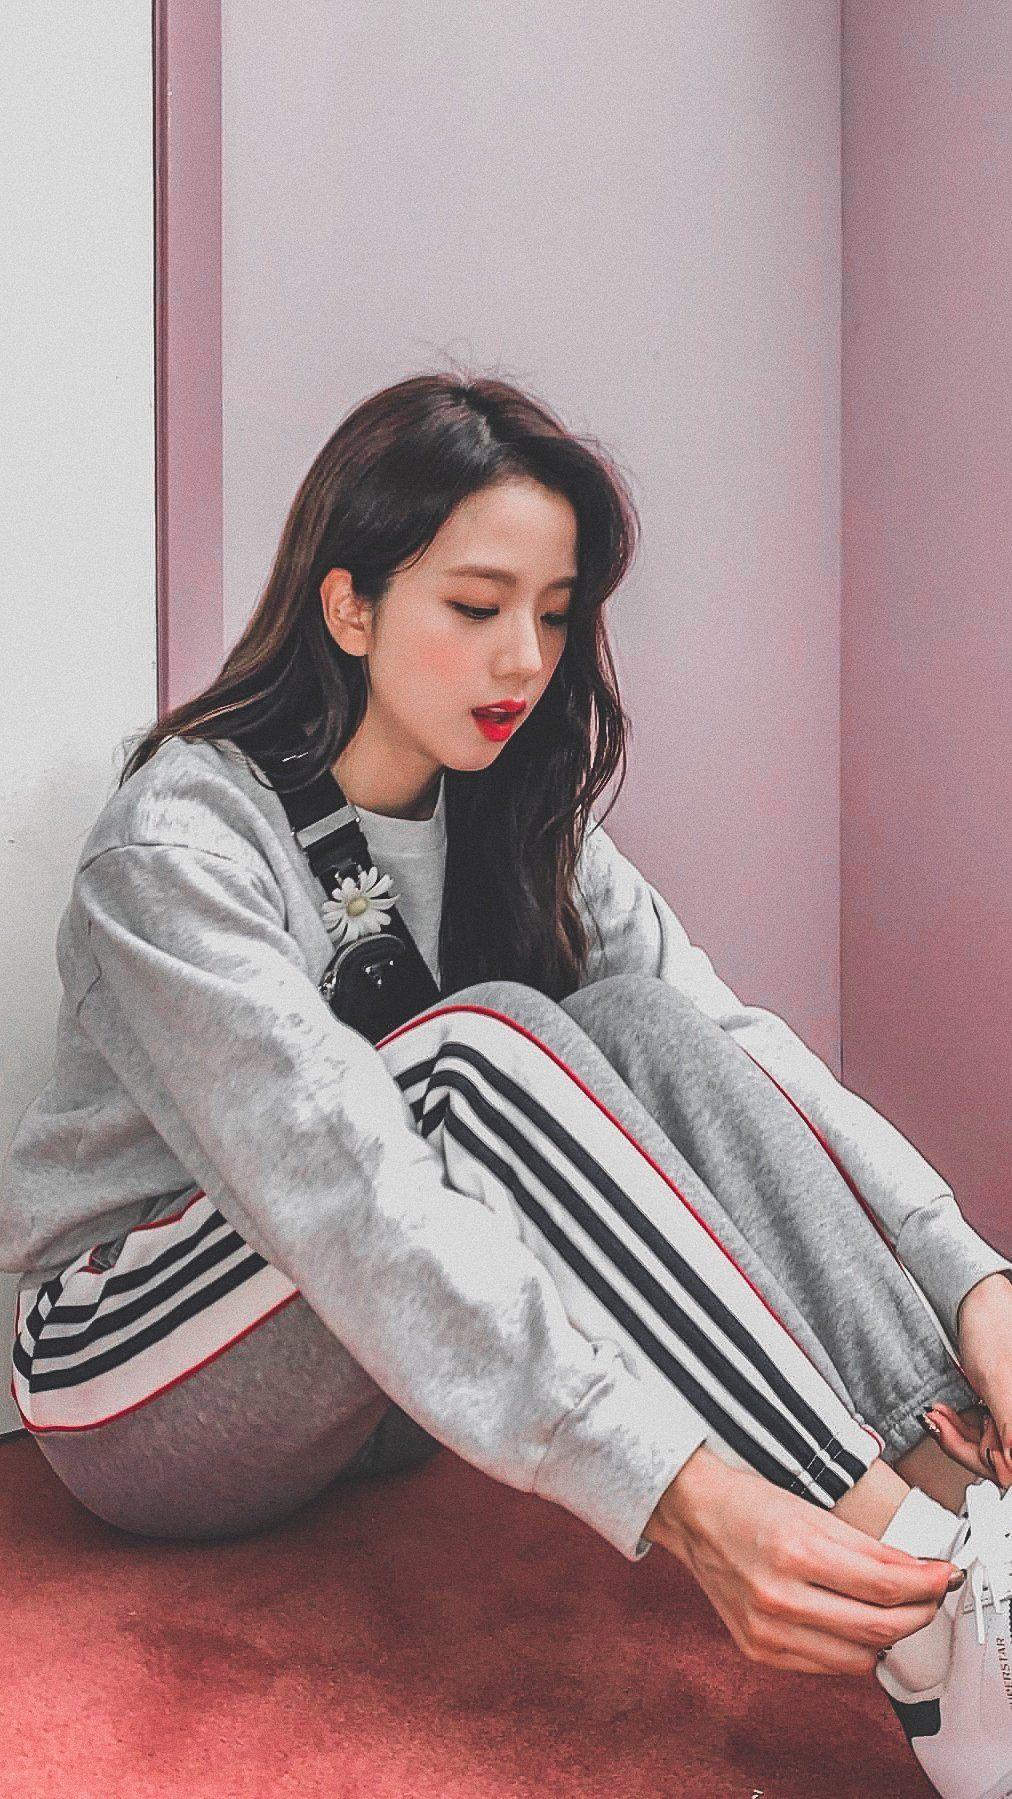 ᵇnara On Twitter In 2020 Blackpink Jisoo Black Pink Blackpink